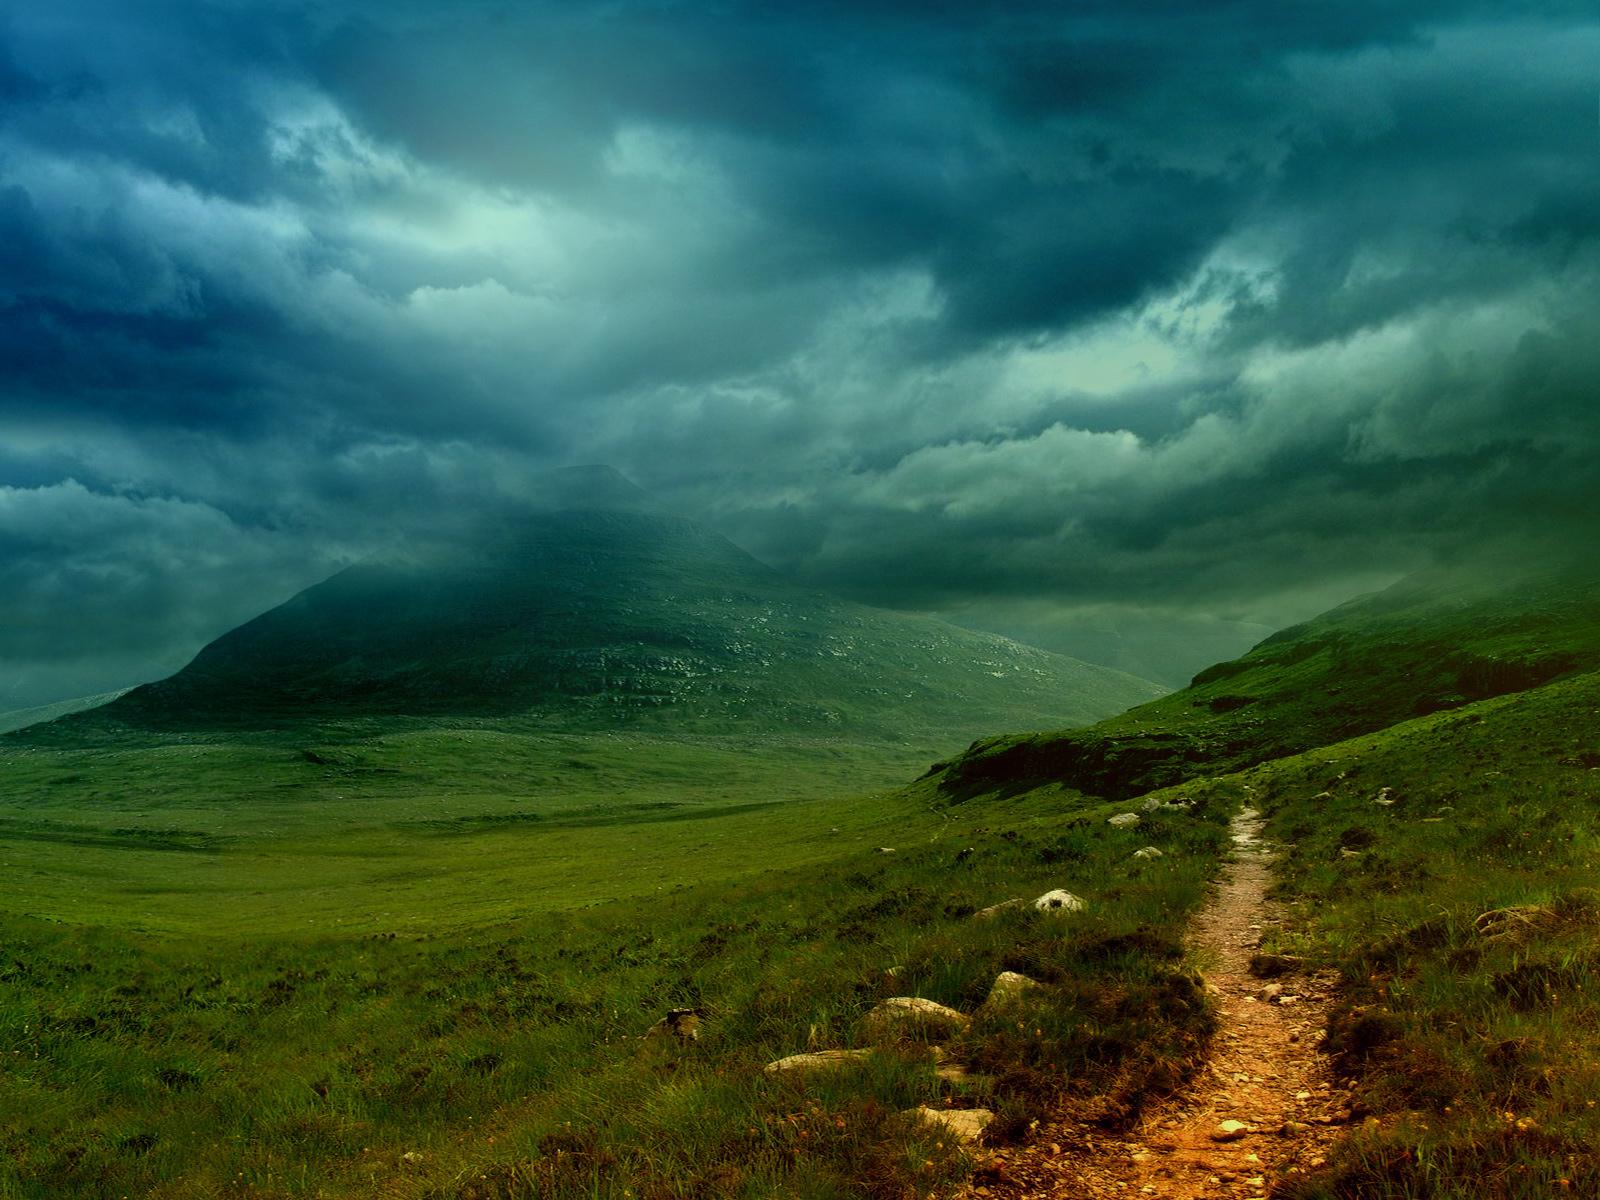 http://3.bp.blogspot.com/_zvVJlXQcrek/TTgkNTW4iSI/AAAAAAAAAE0/v0mpVtmqEig/s1600/Nature_Beauty_2228.jpg